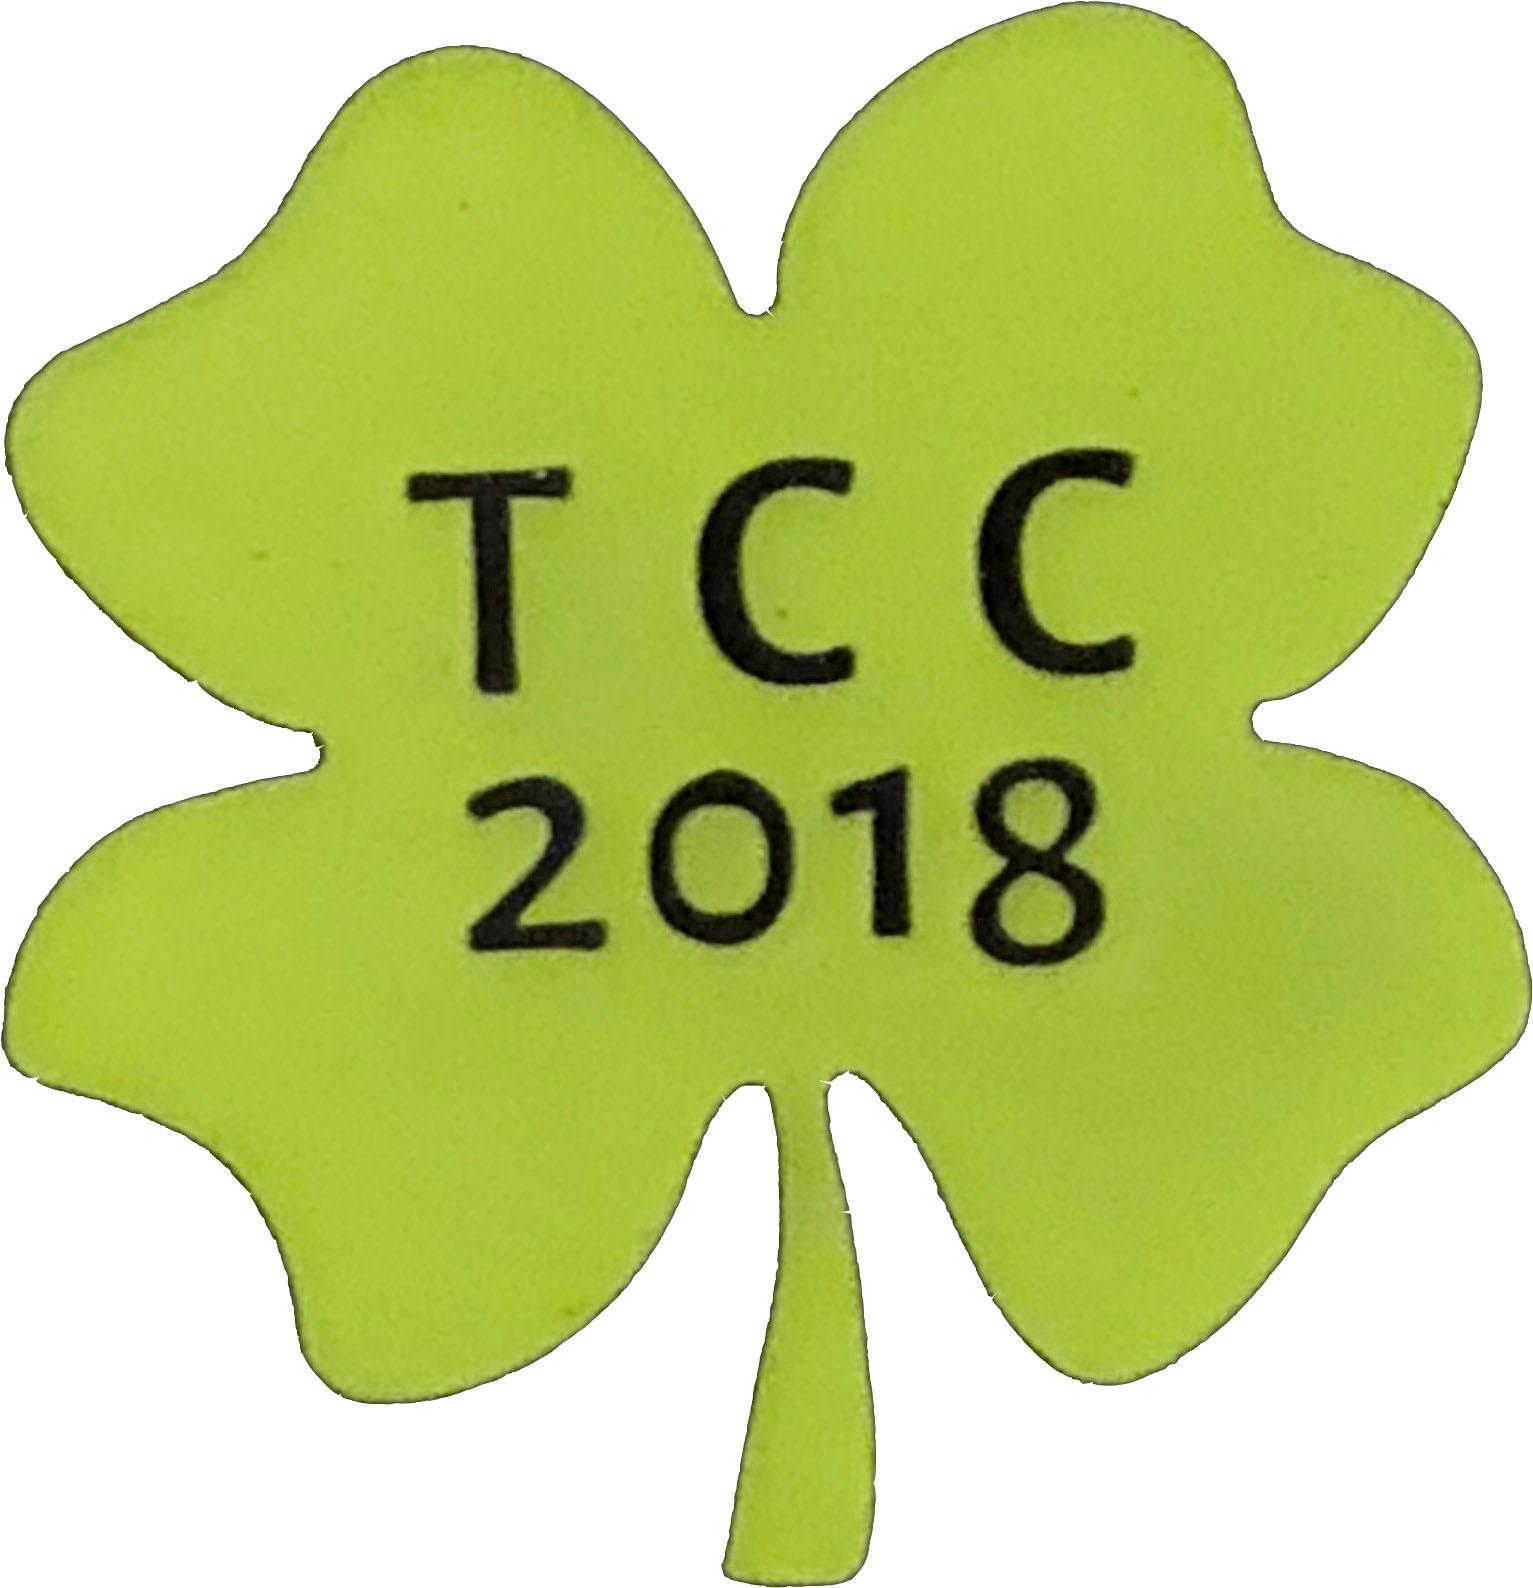 Kleeblatt TCC